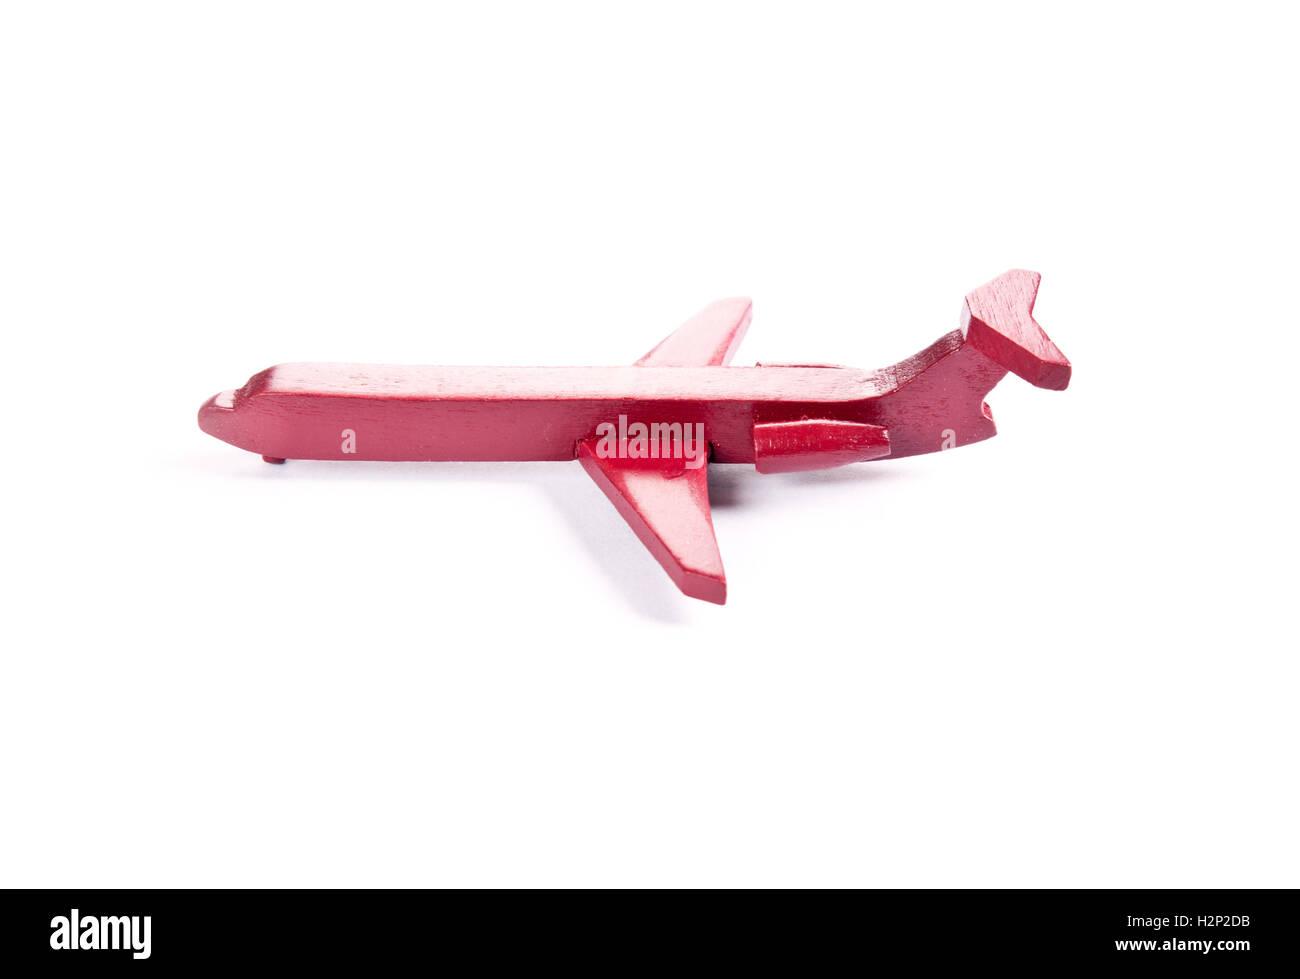 Spielzeugflugzeug in roter Farbe Stockbild